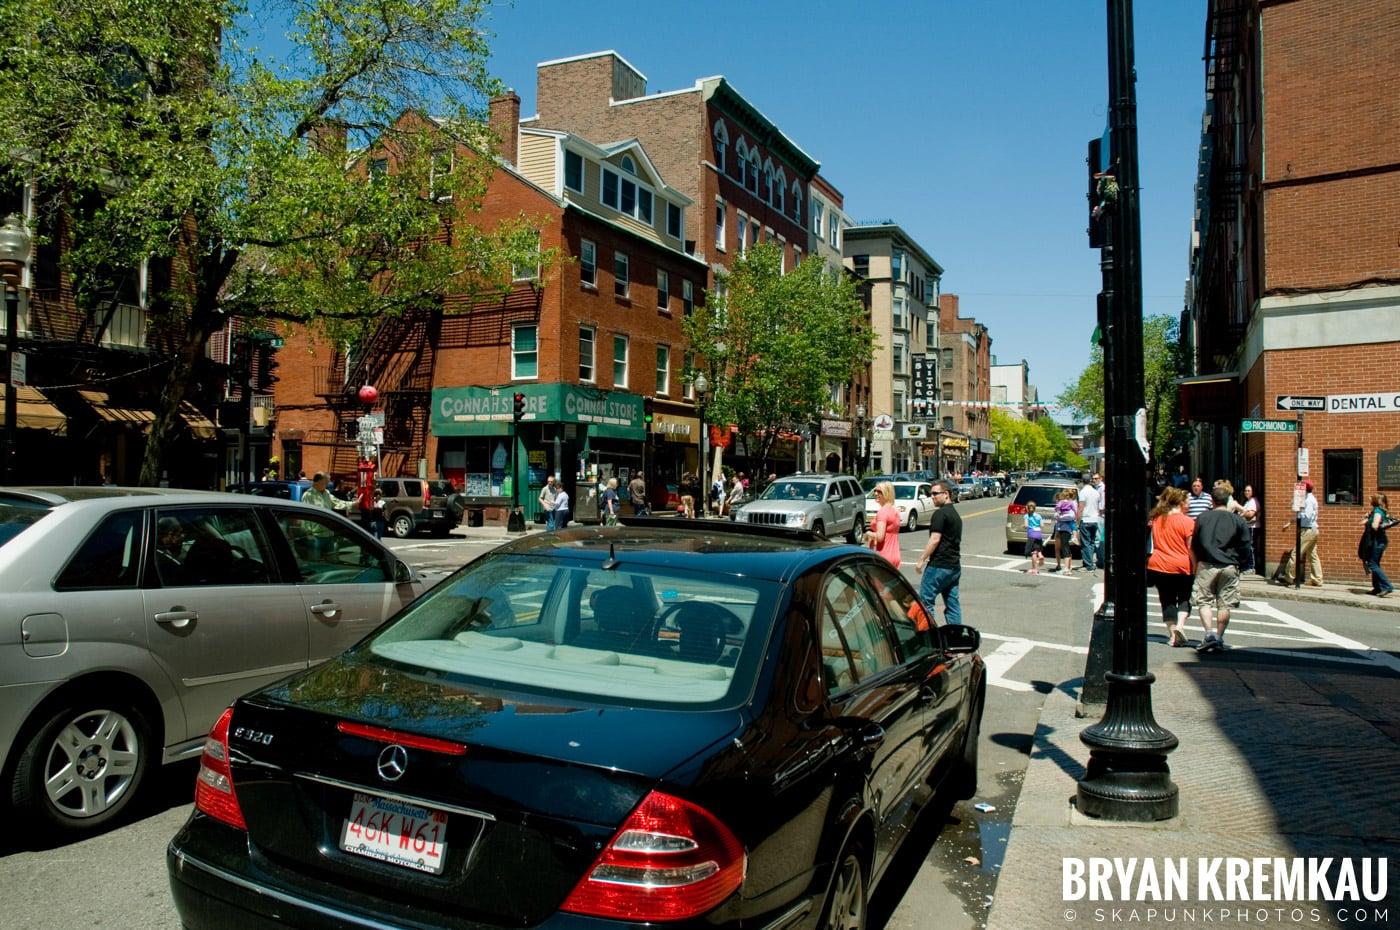 Memorial Day Weekend Trip to Boston - 5.25.08 (7)